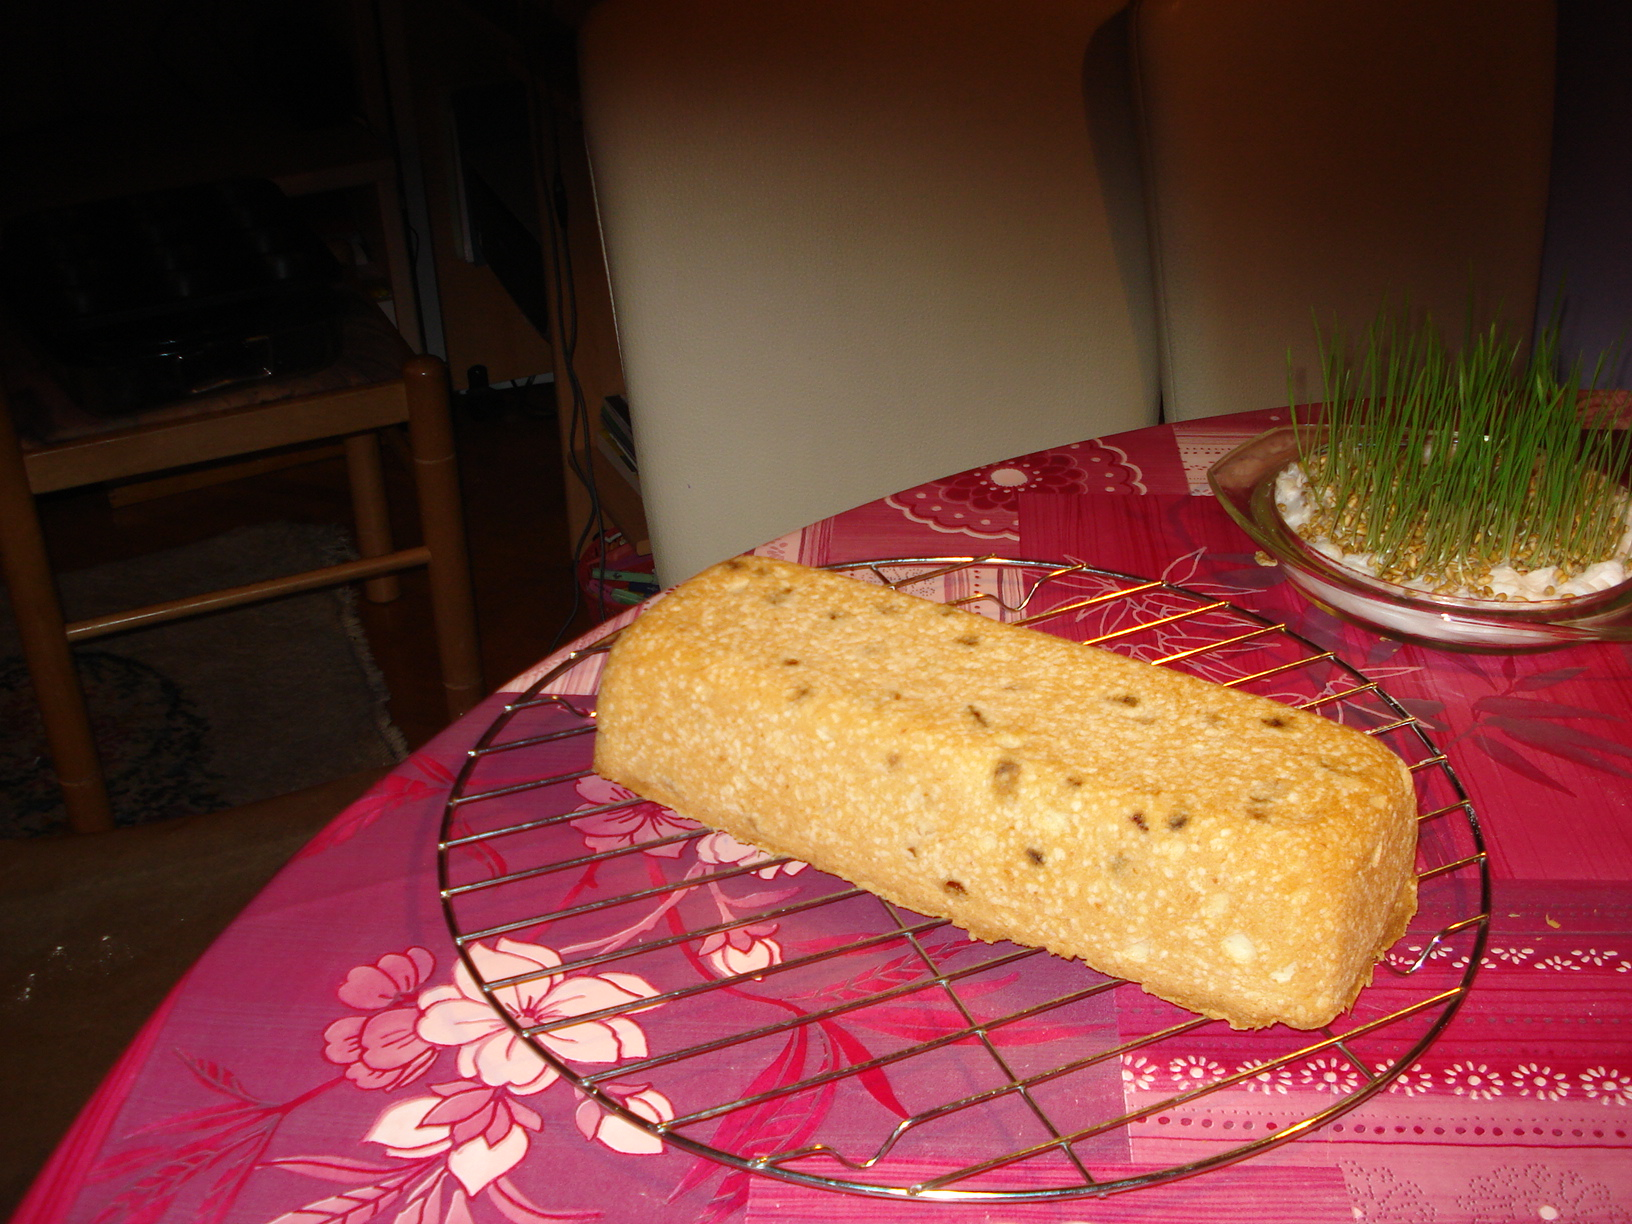 kolač na hlađenju